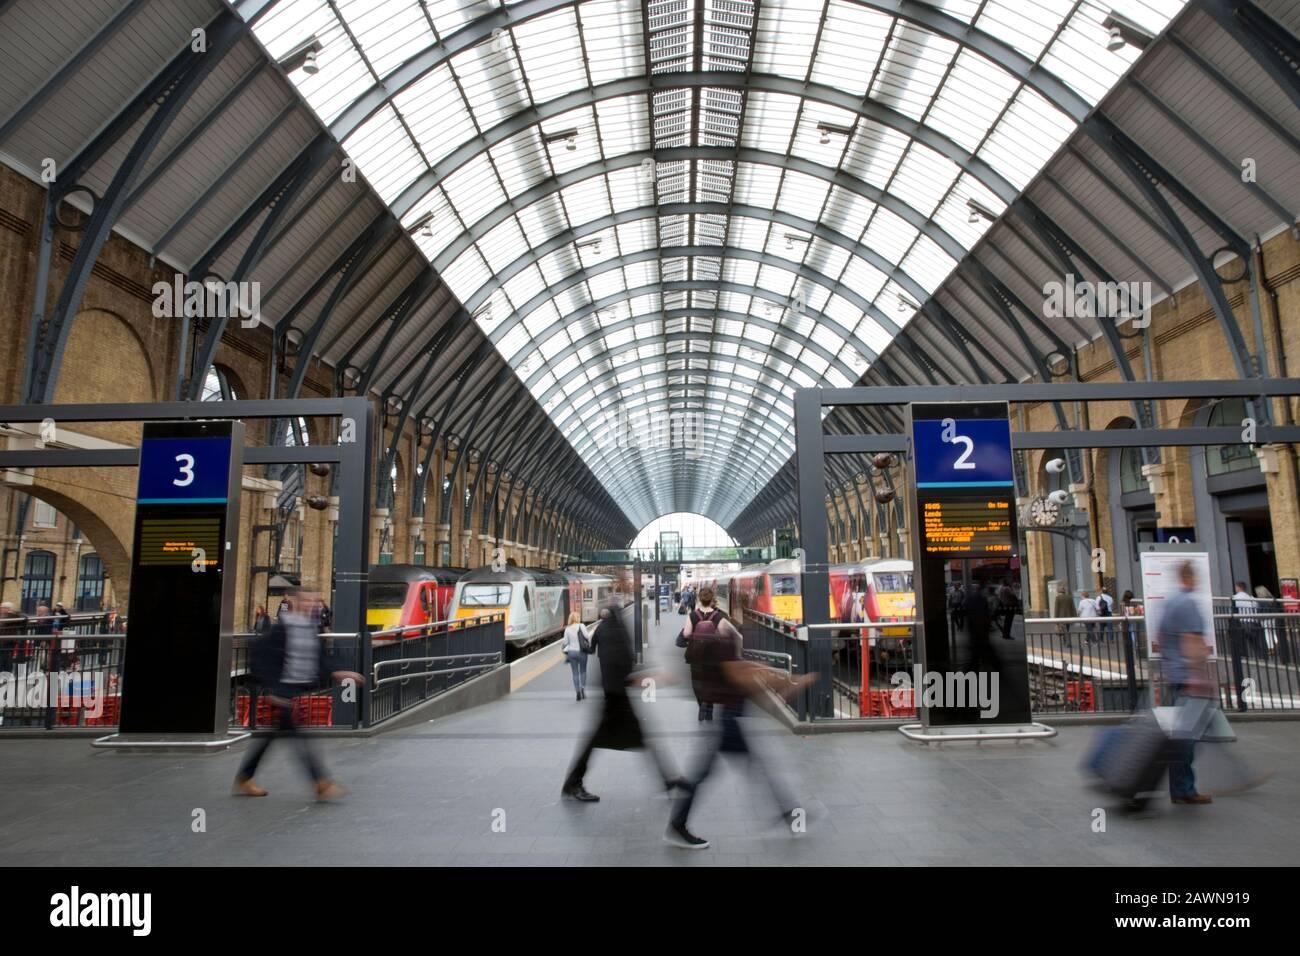 Kings Cross railway station, London, England Stock Photo